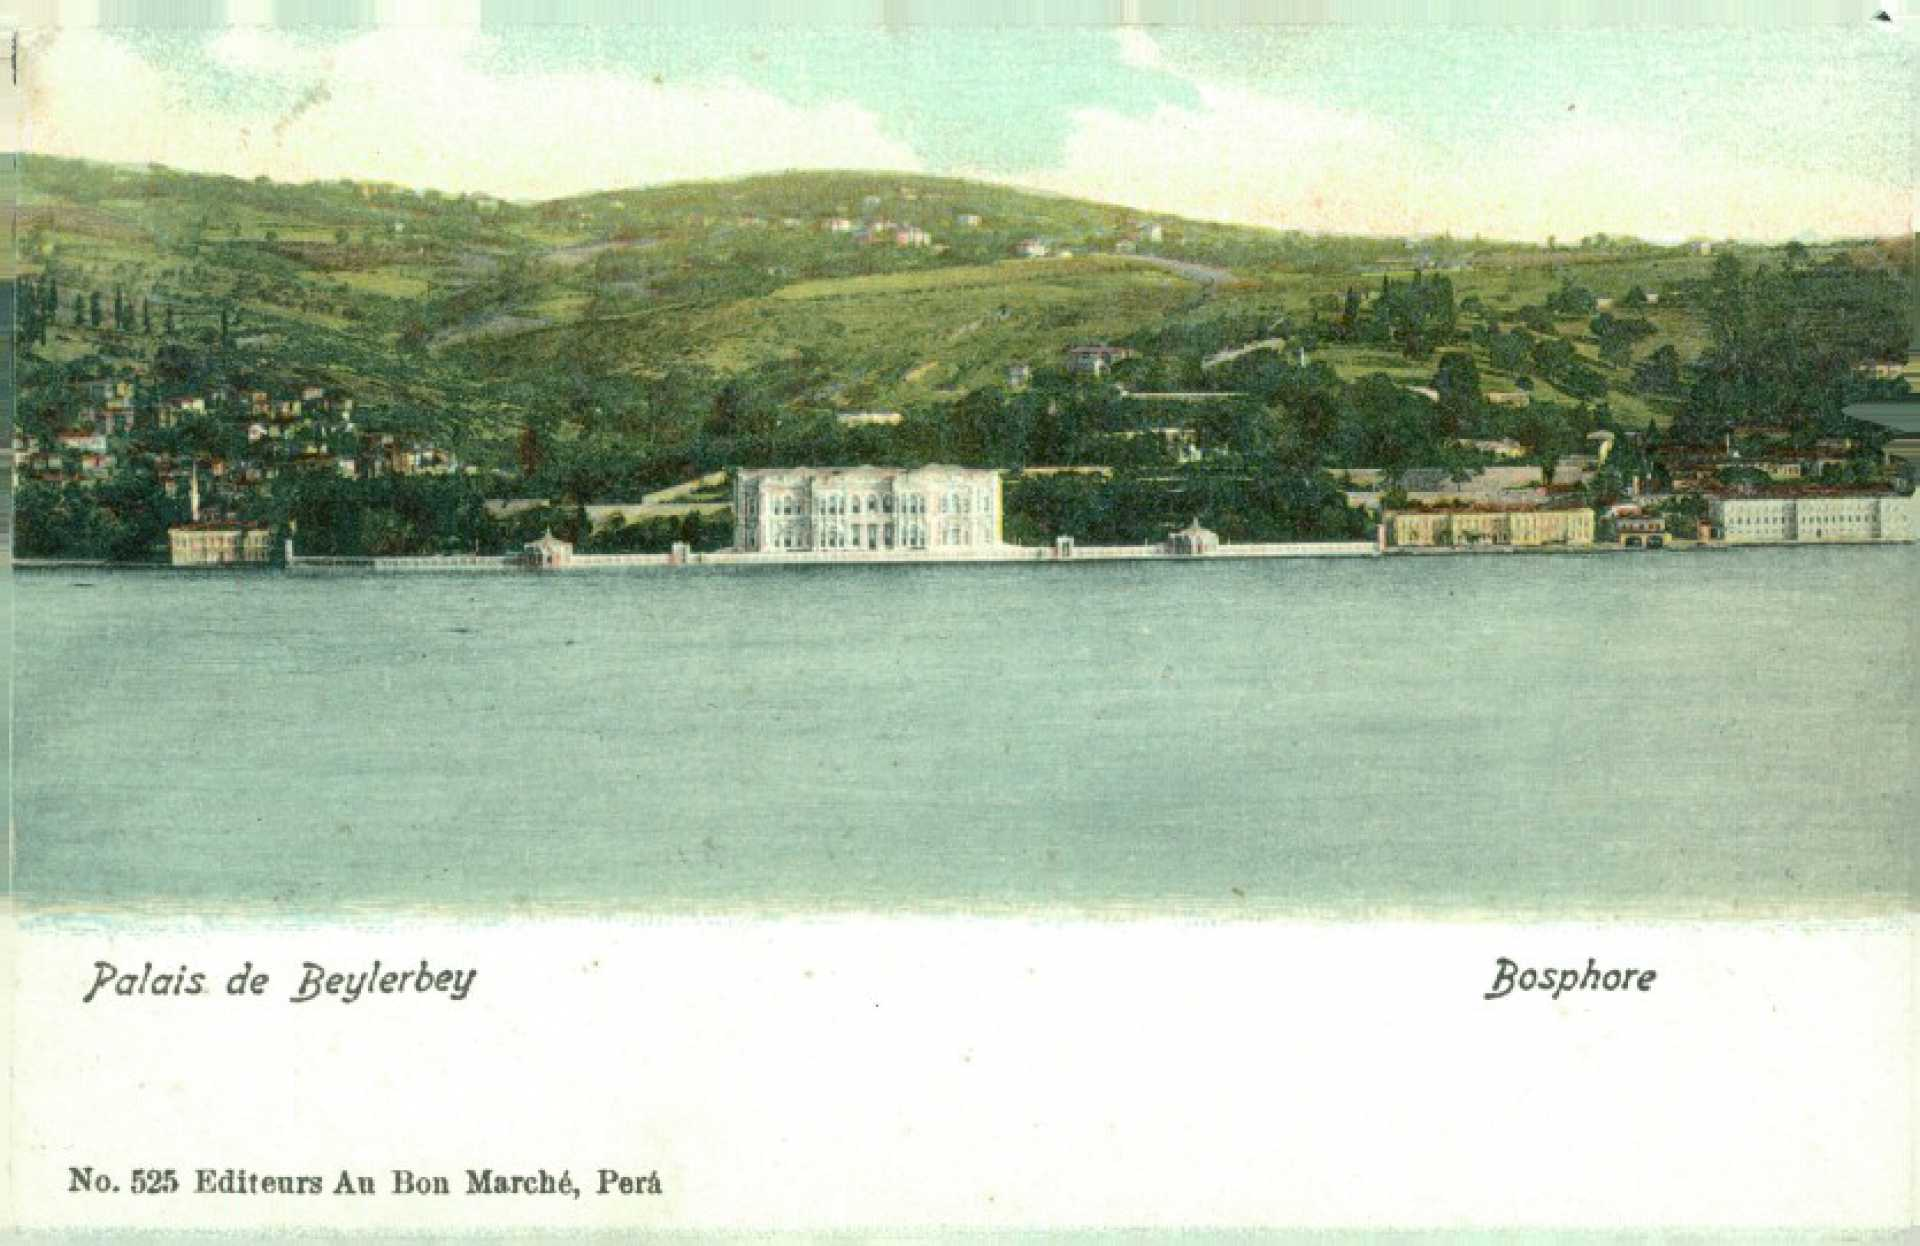 Palais de Beylerbey Bosphore